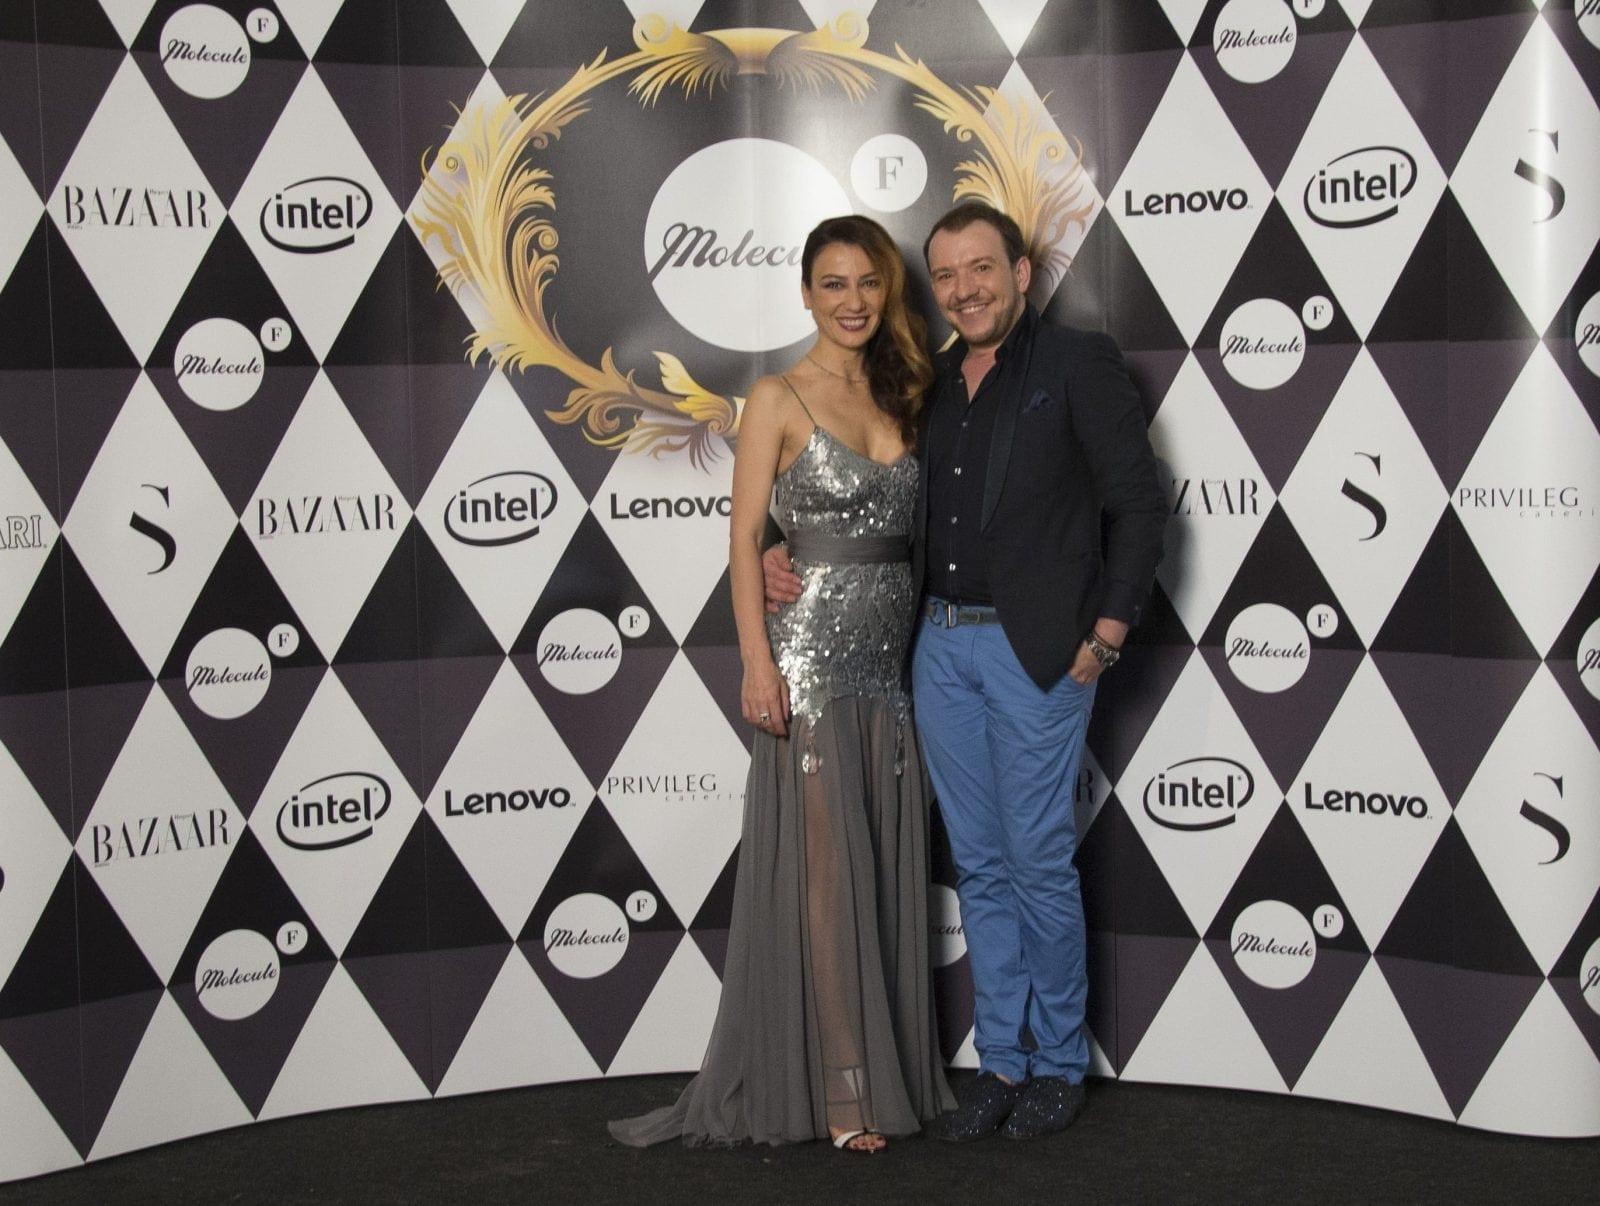 Mirela Bucovicean & Stephan Pelger